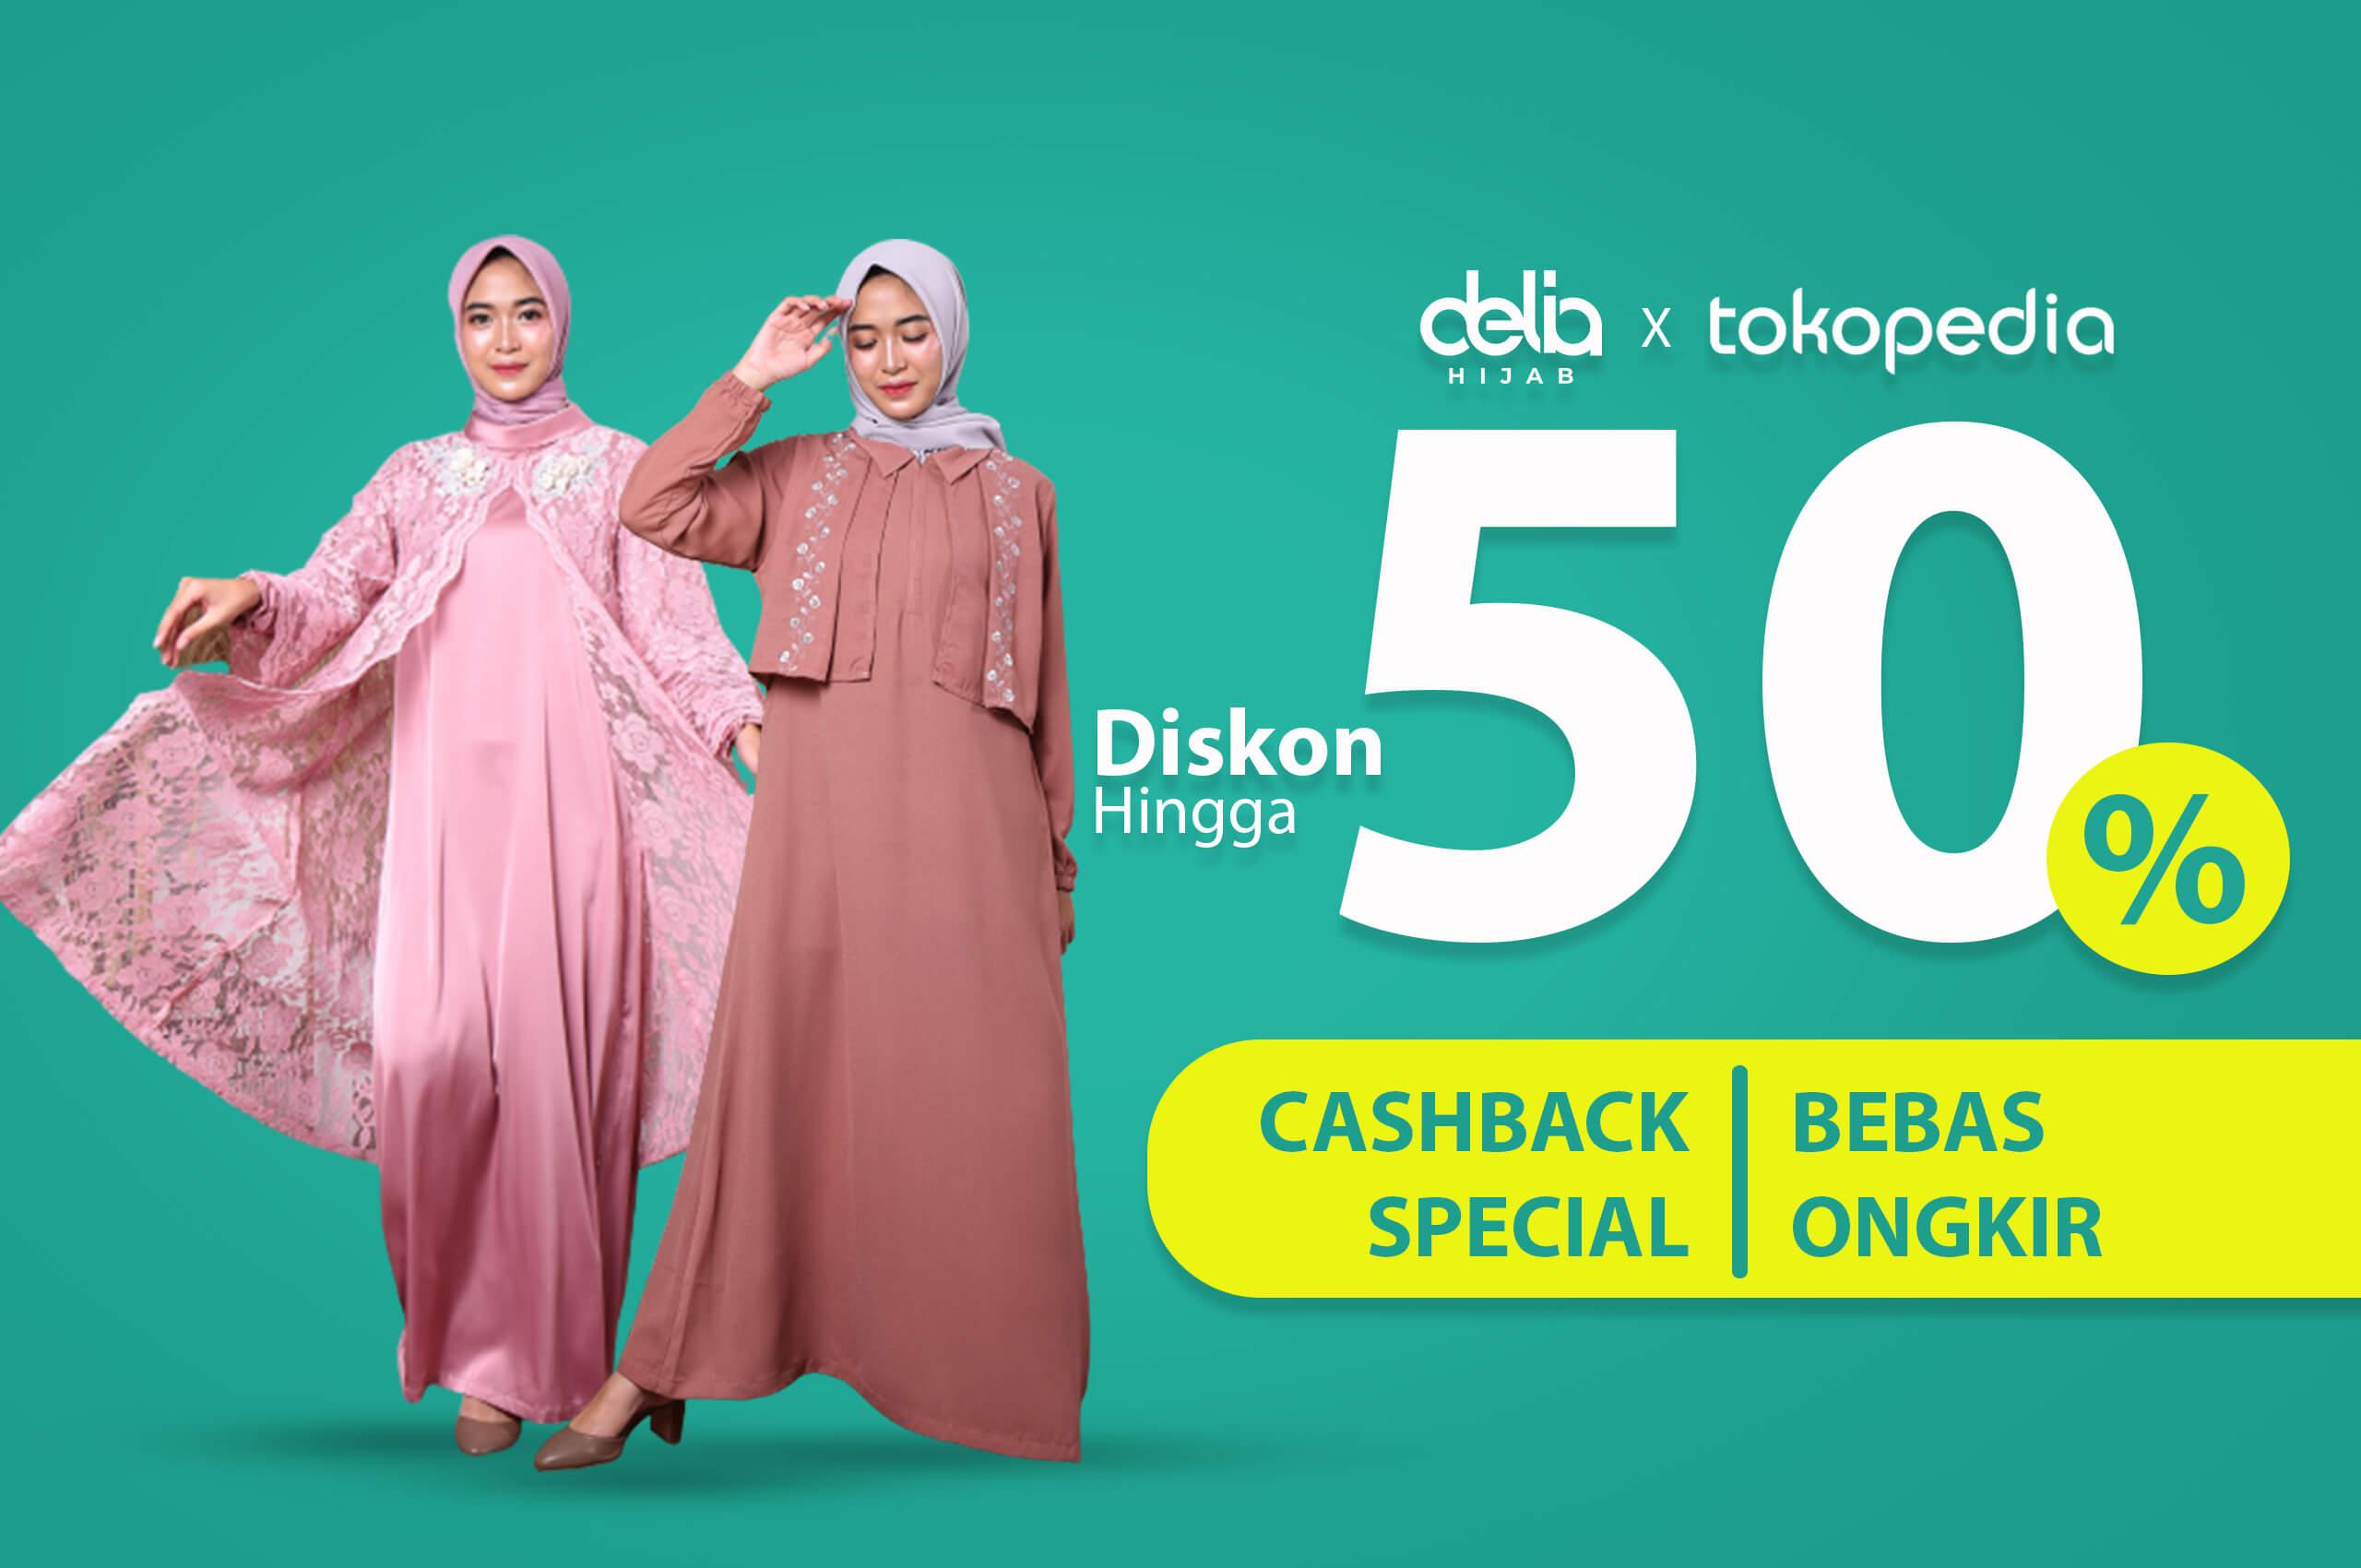 Promo Tokopedia Delia Hijab - Waktu Indonesia Belanja Tokopedia WIB P 190221